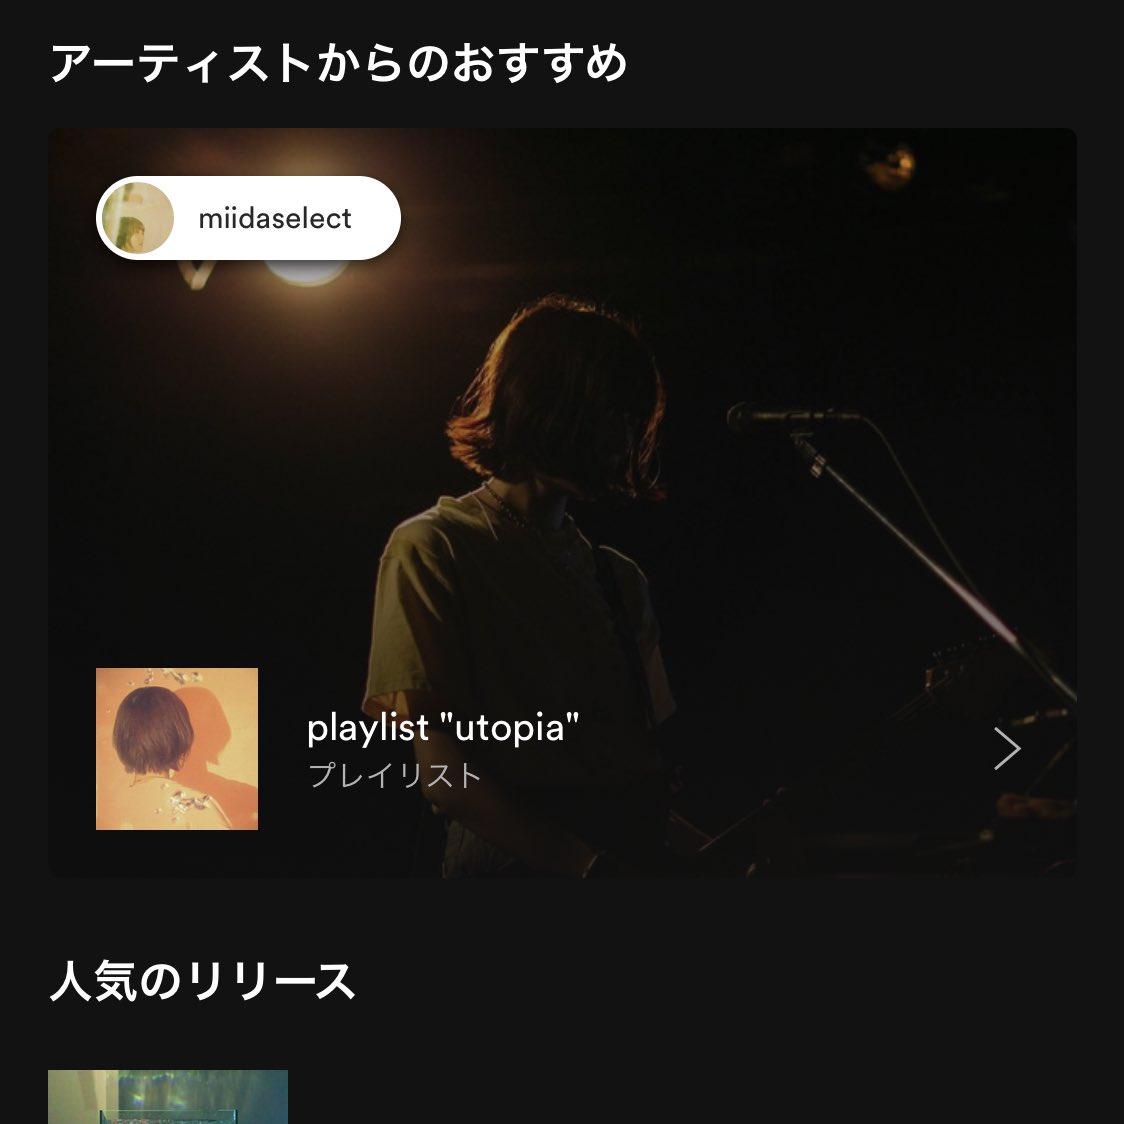 【miida select】 @SpotifyJP playlistに曲を追加👏